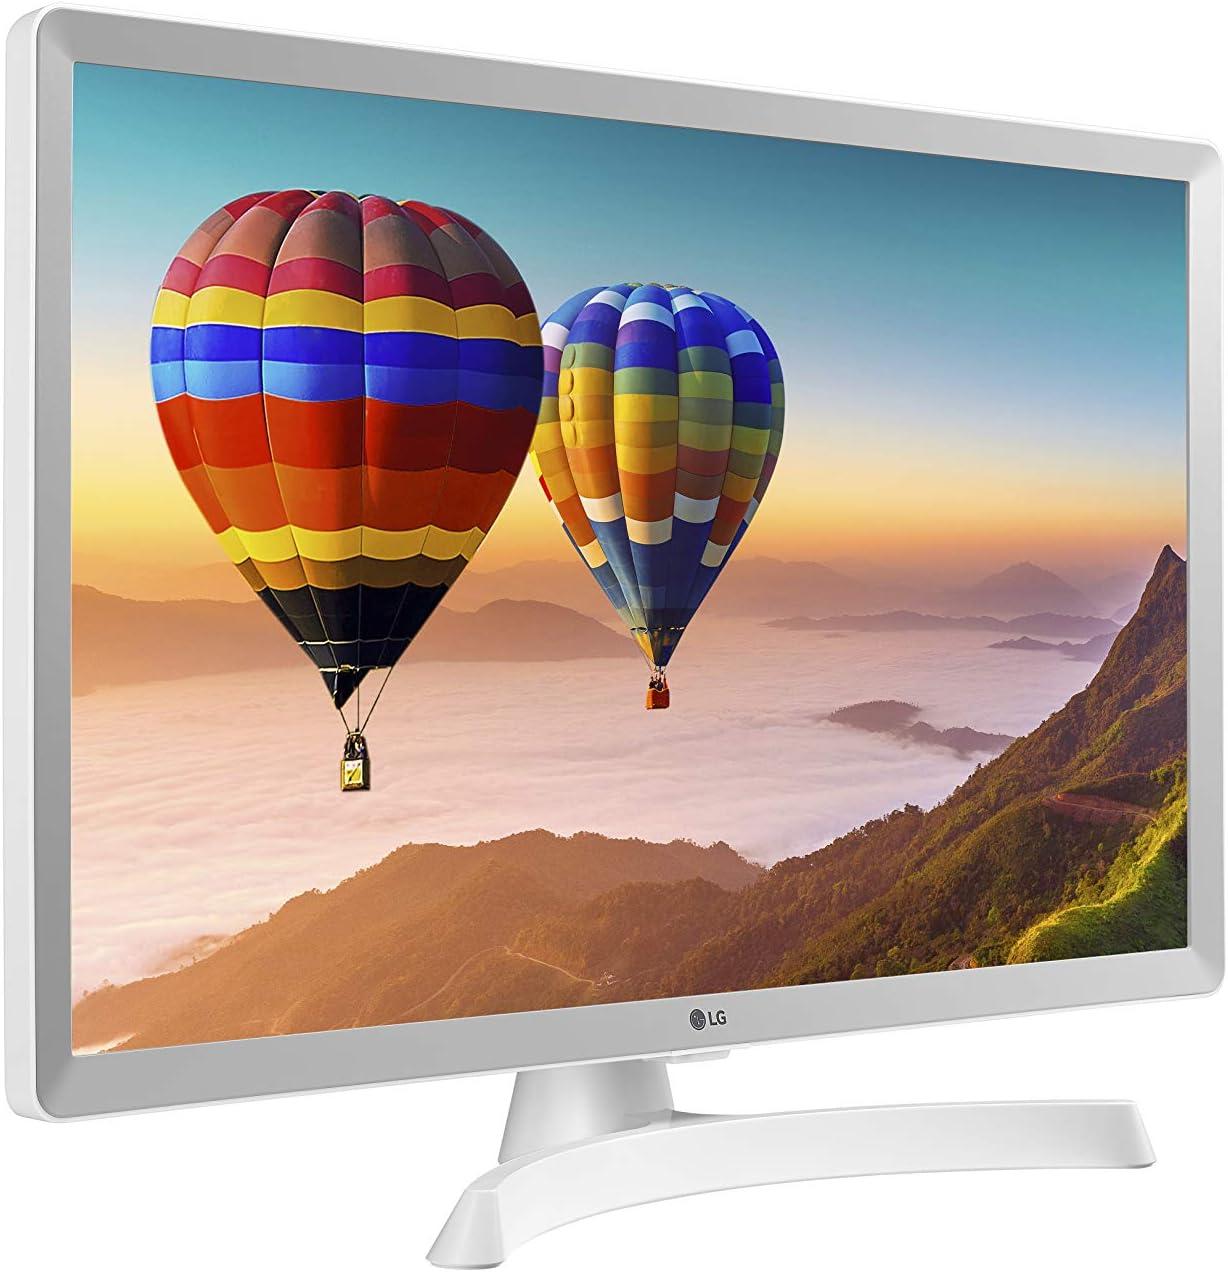 con Pantalla LED HD 1366 x 768, 16:9, DVB-T2//C//S2, WiFi, 5 ms, 250 CD//m2, 5 M:1, Miracast, 10 W, 1 x HDMI 1.3, 1 x USB 2.0 28 LG 28TN515S- WZ Monitor Smart TV de 70 cm Color Blanco